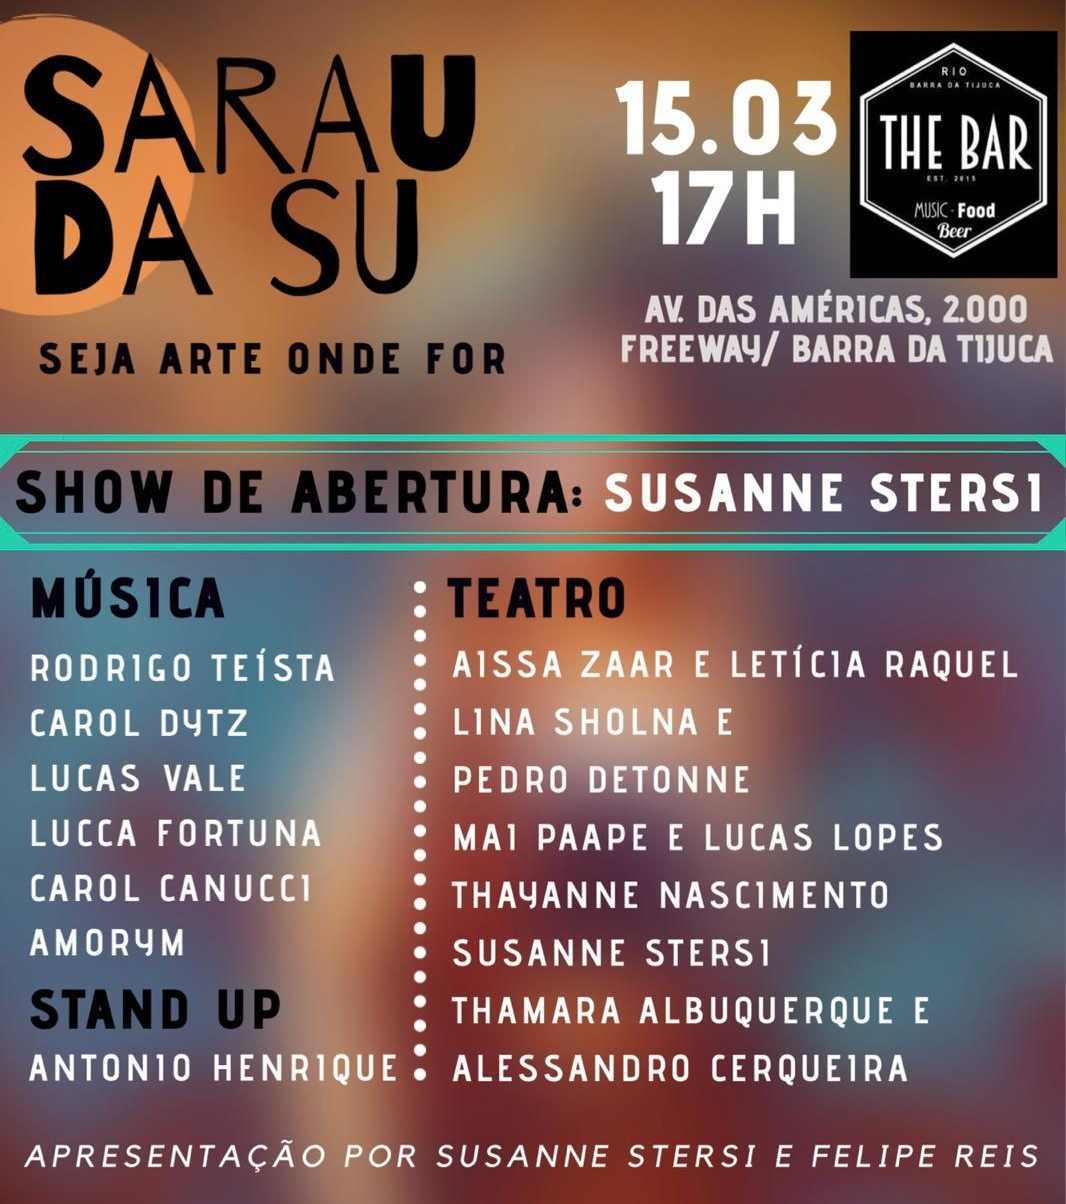 Susanne Stersi apresenta o Sarau da Su. Veja no Vivente Andante.